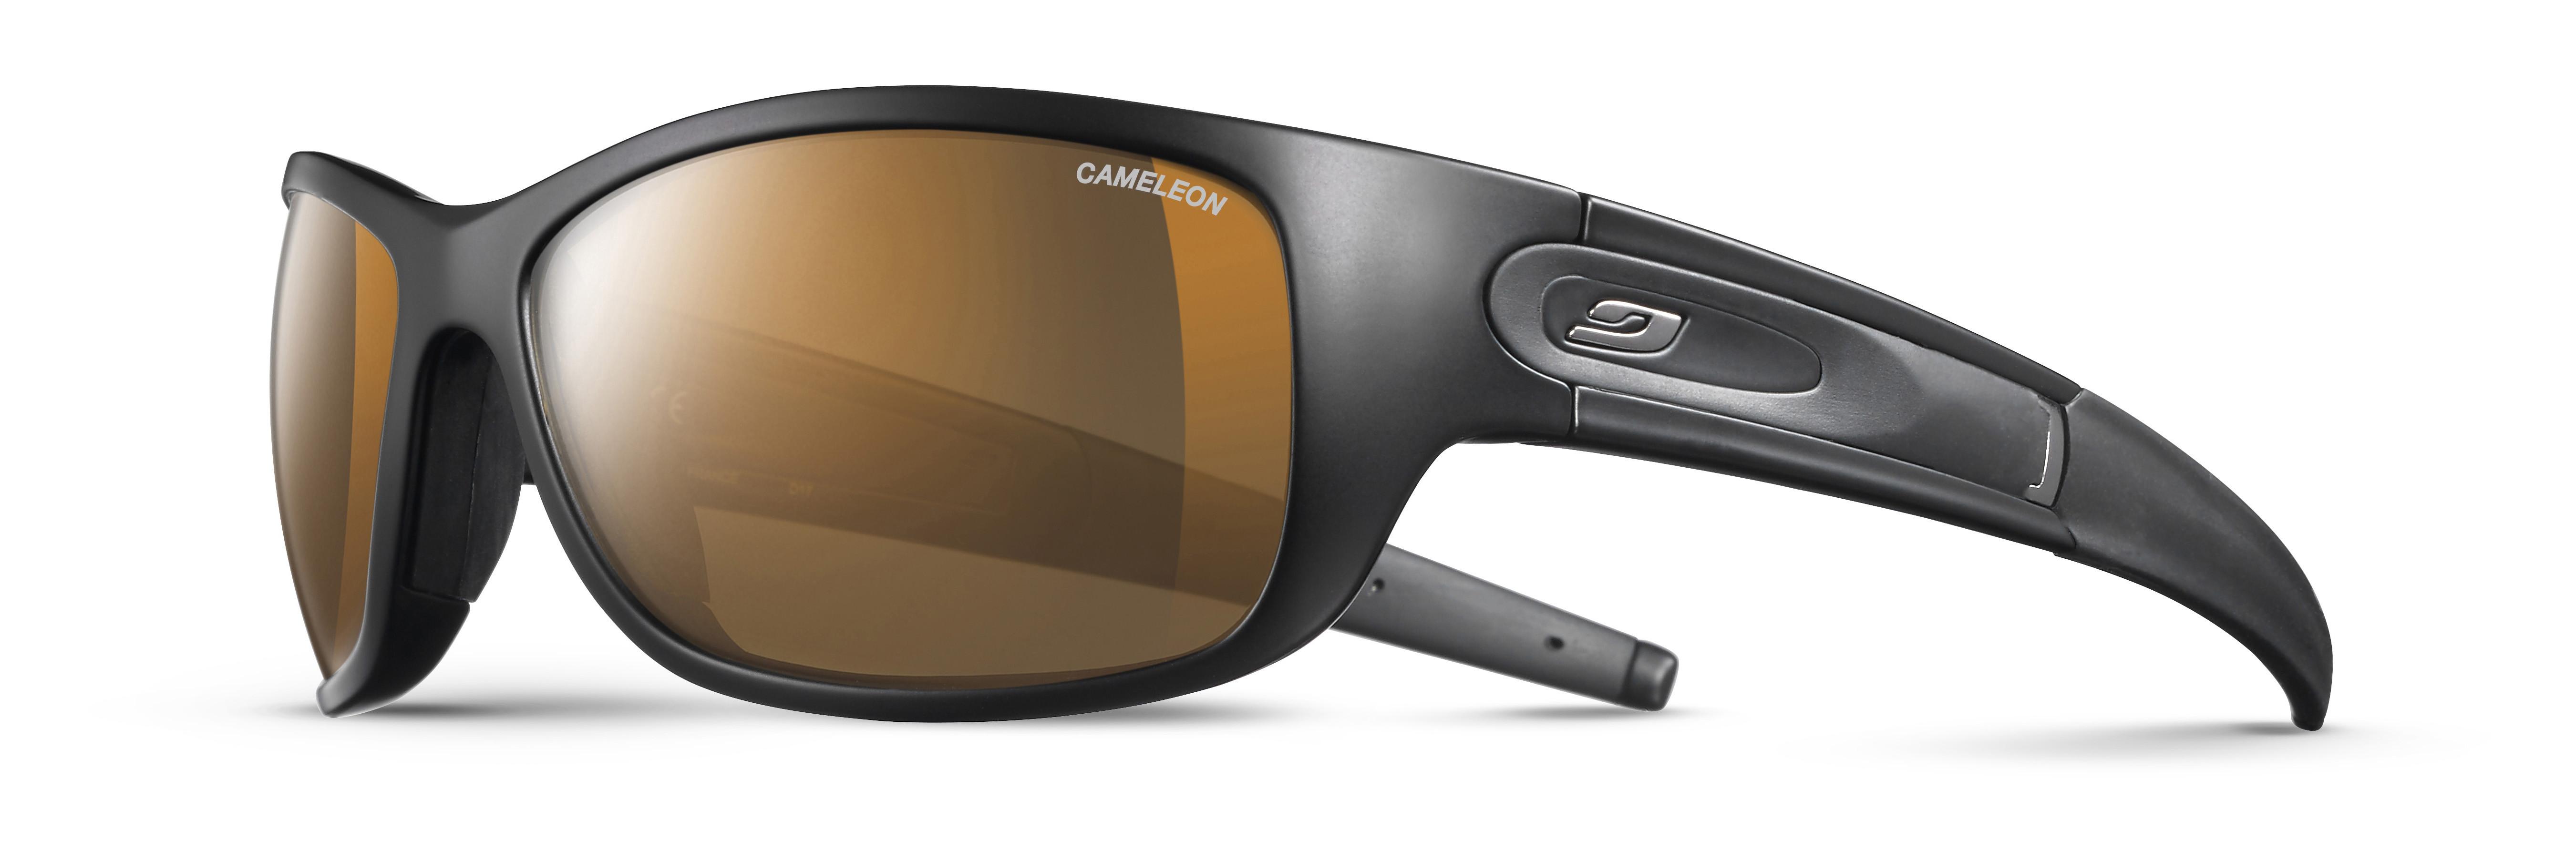 Julbo Stony J4595014 Sonnenbrille Sportbrille 6M2cK8z